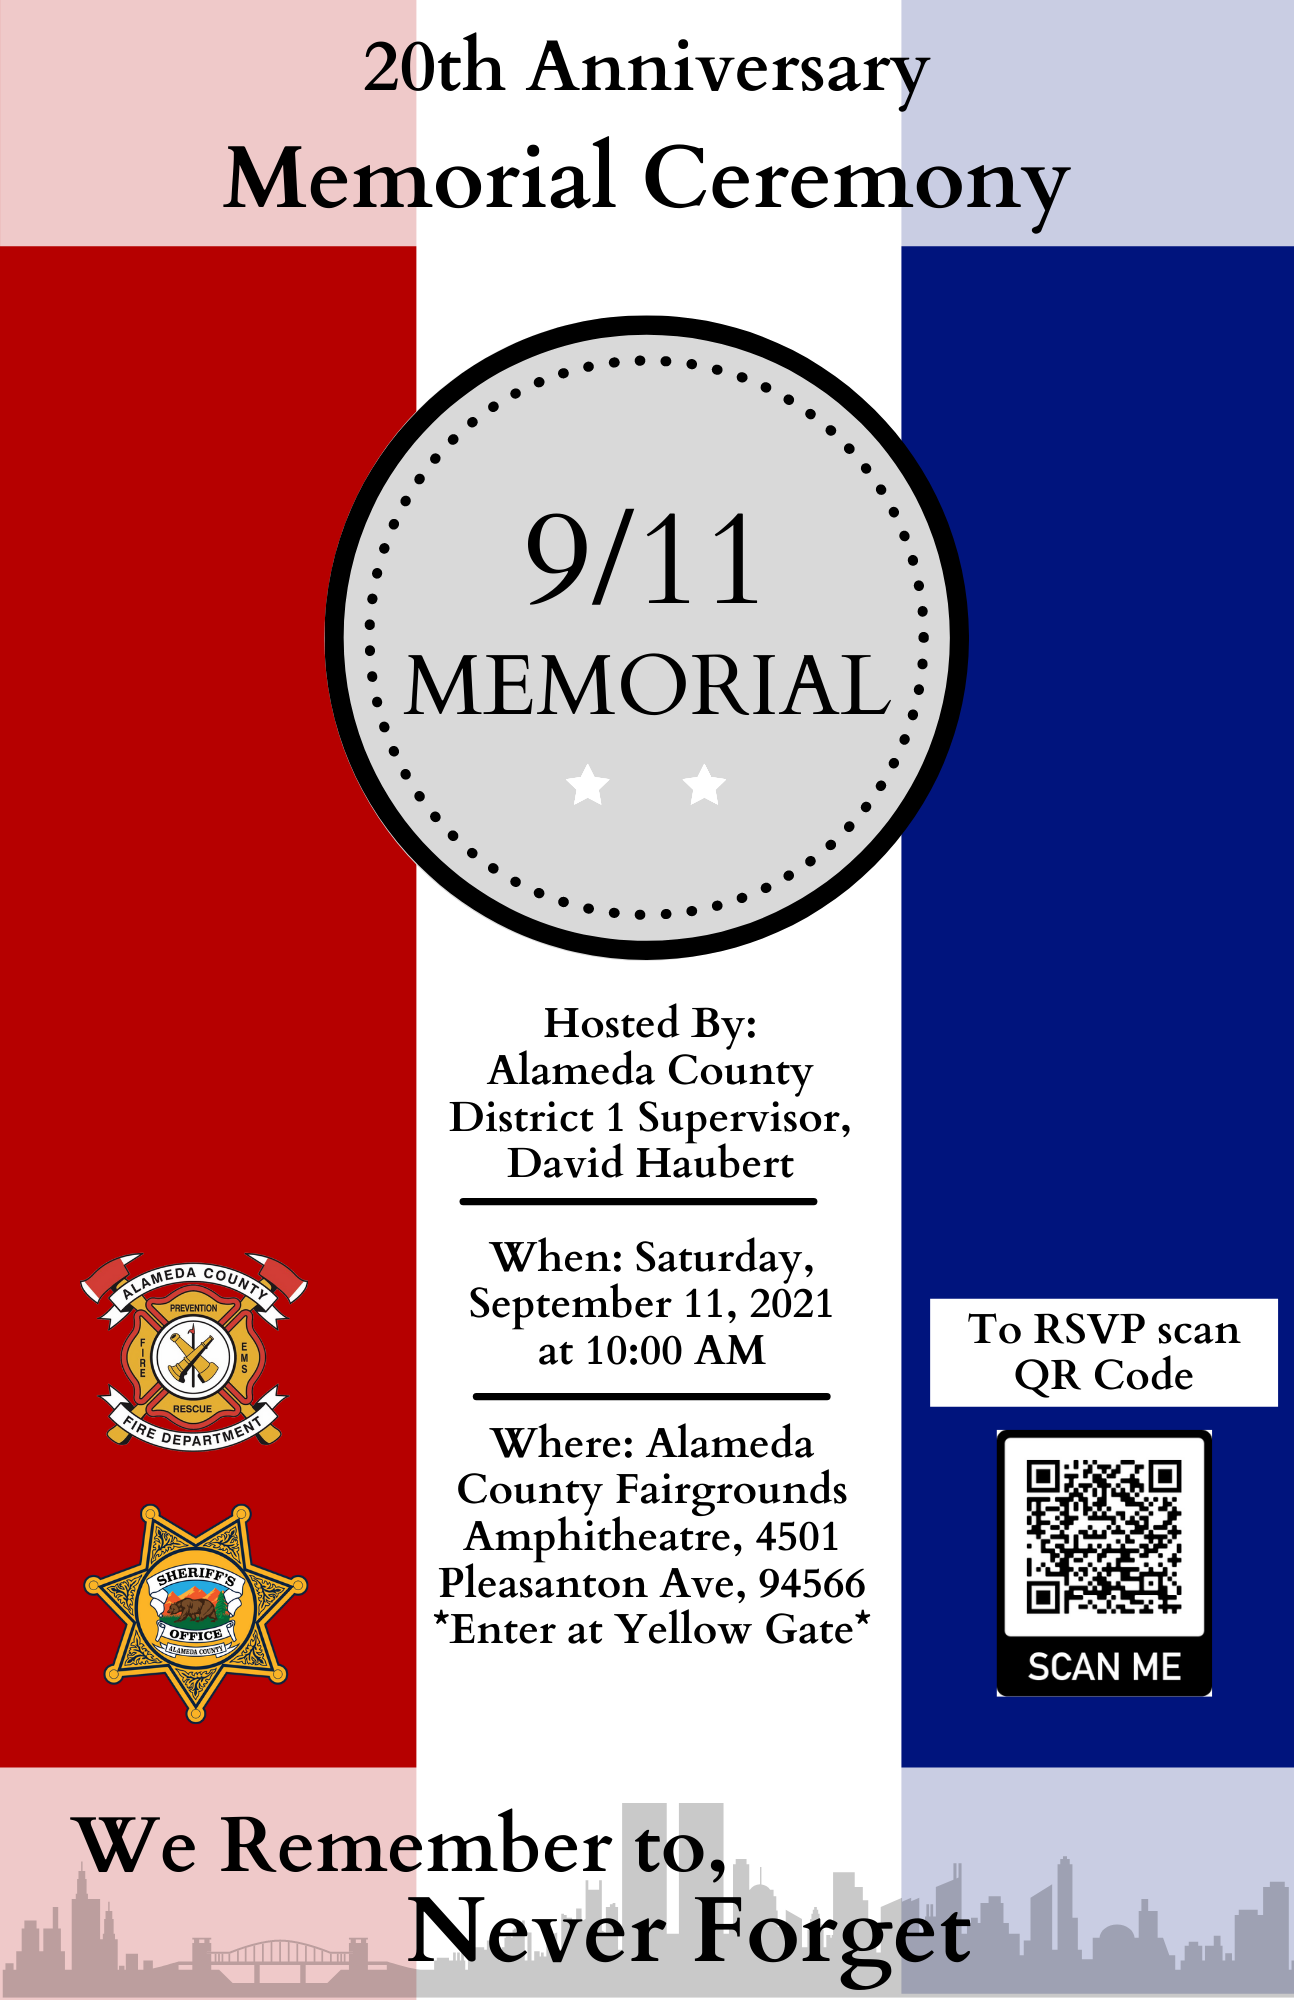 9/11 Flyer